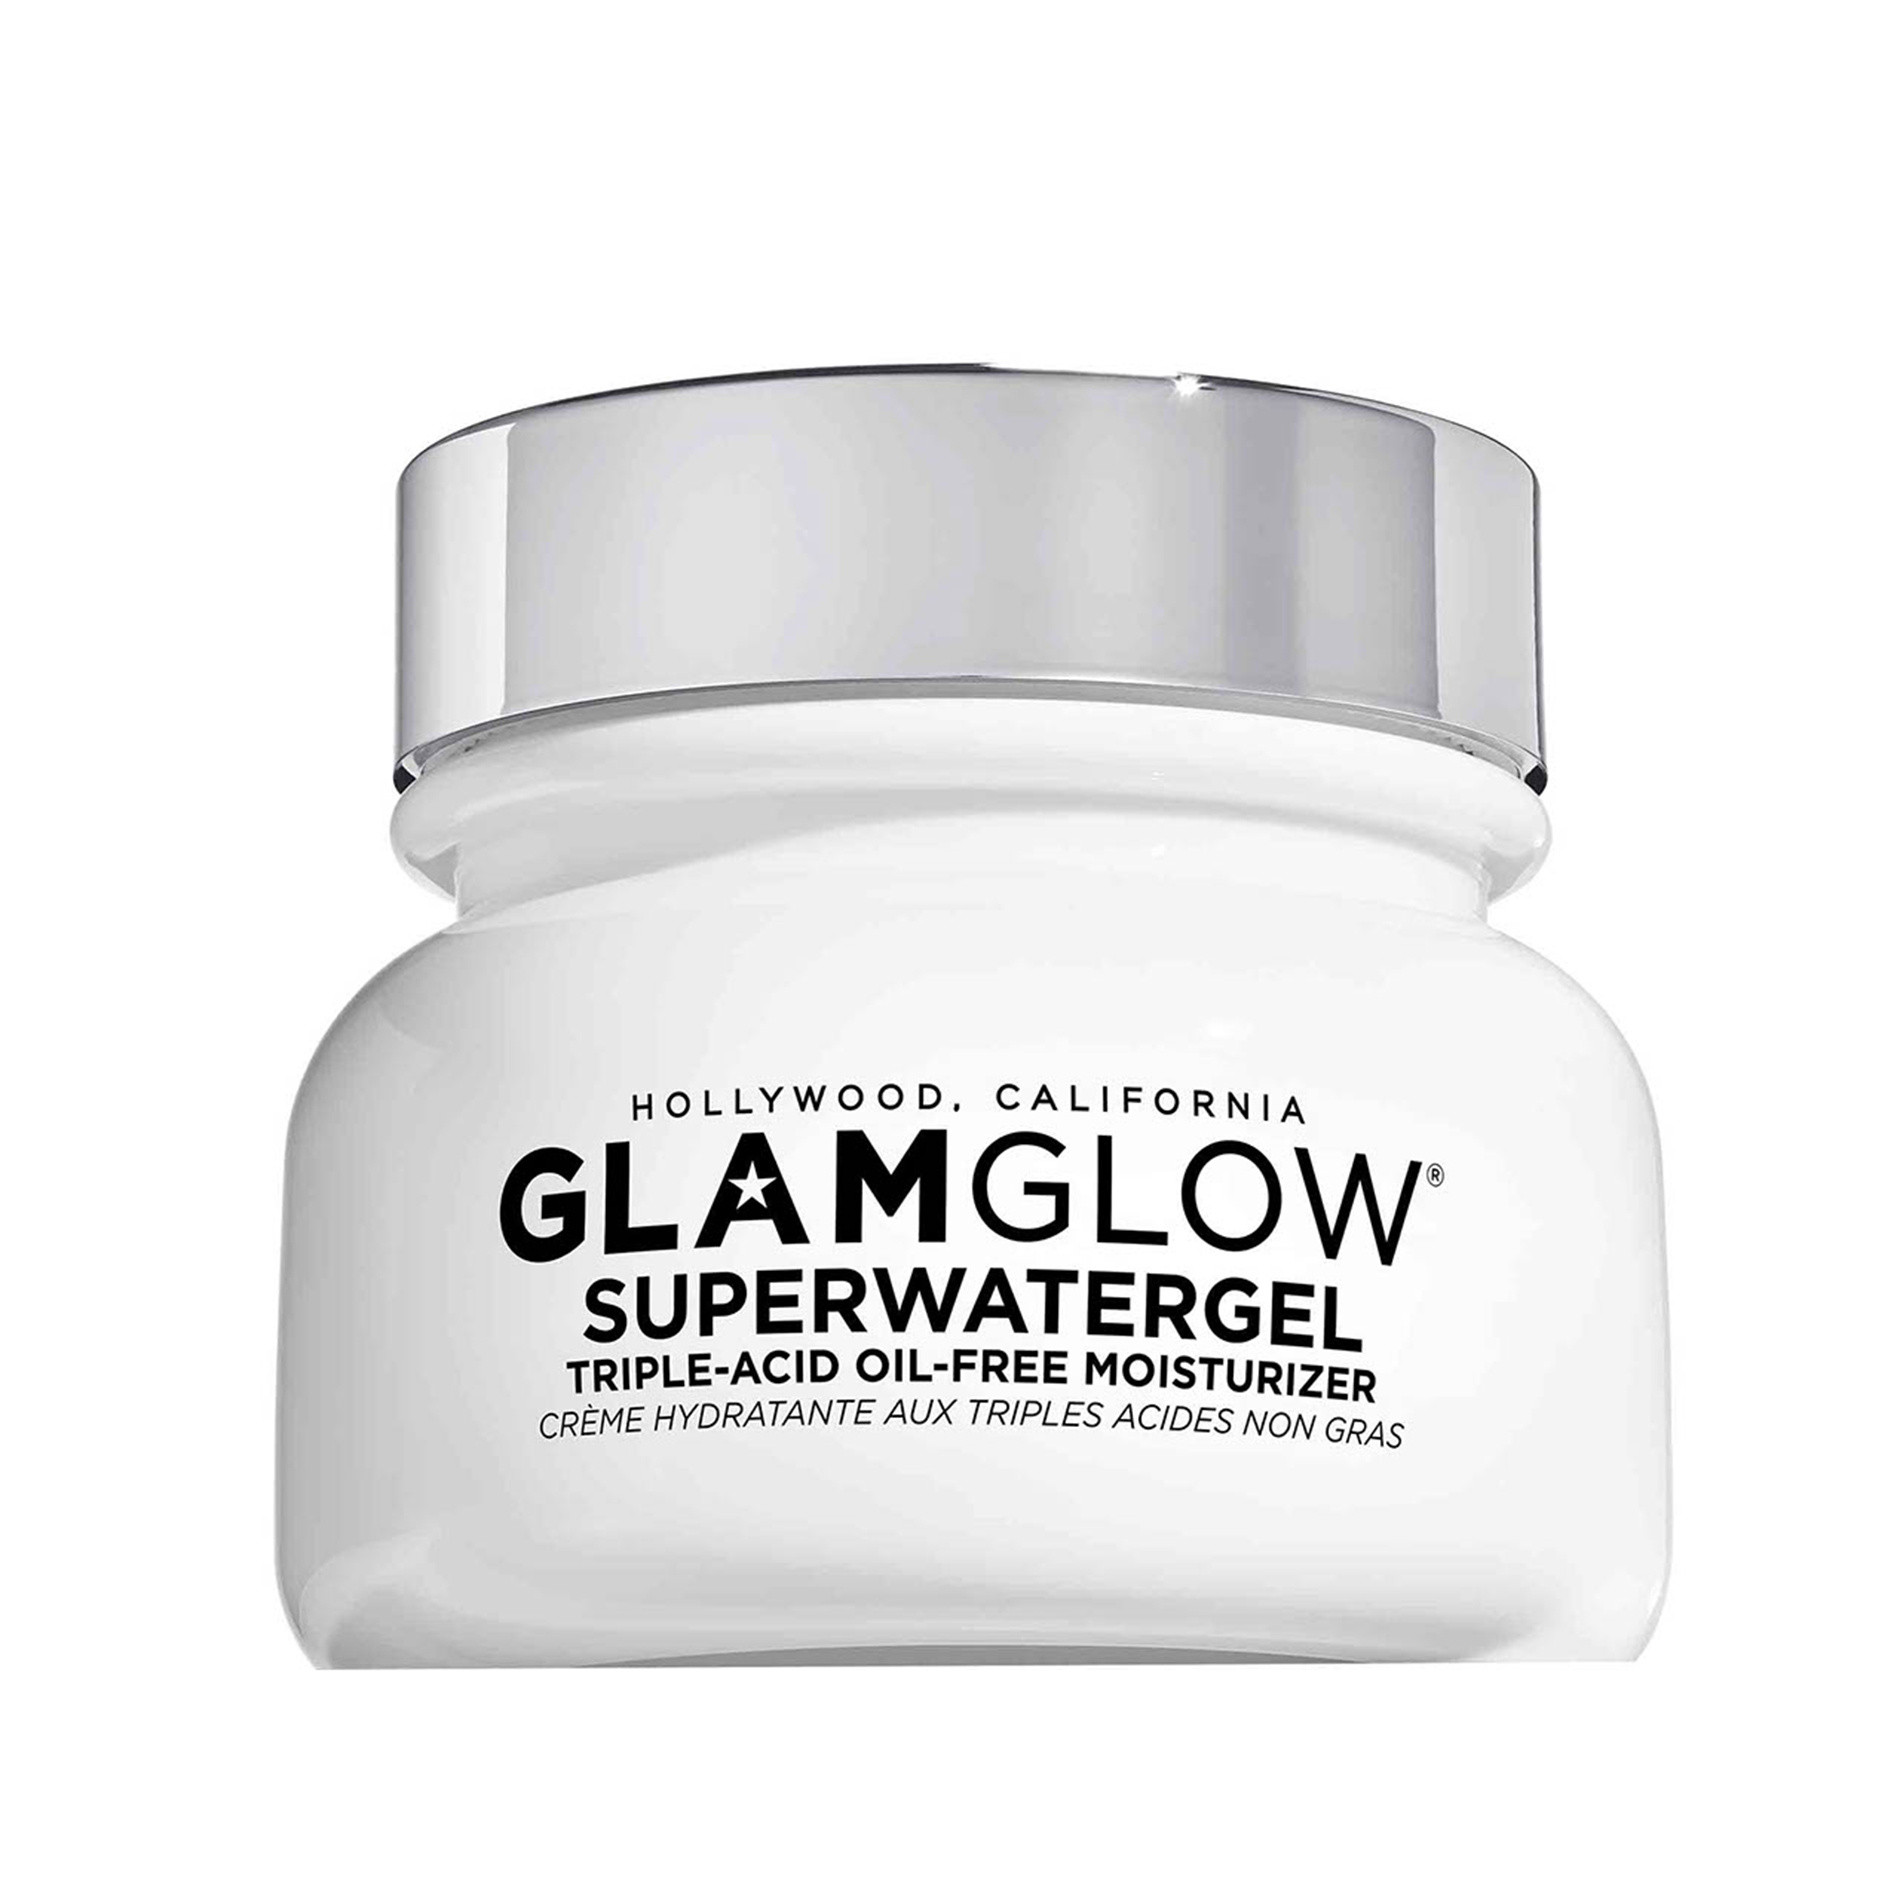 Glamglow superwatergel triple-acid oil-free moisturizer 50 ml, Bianco, large image number 0